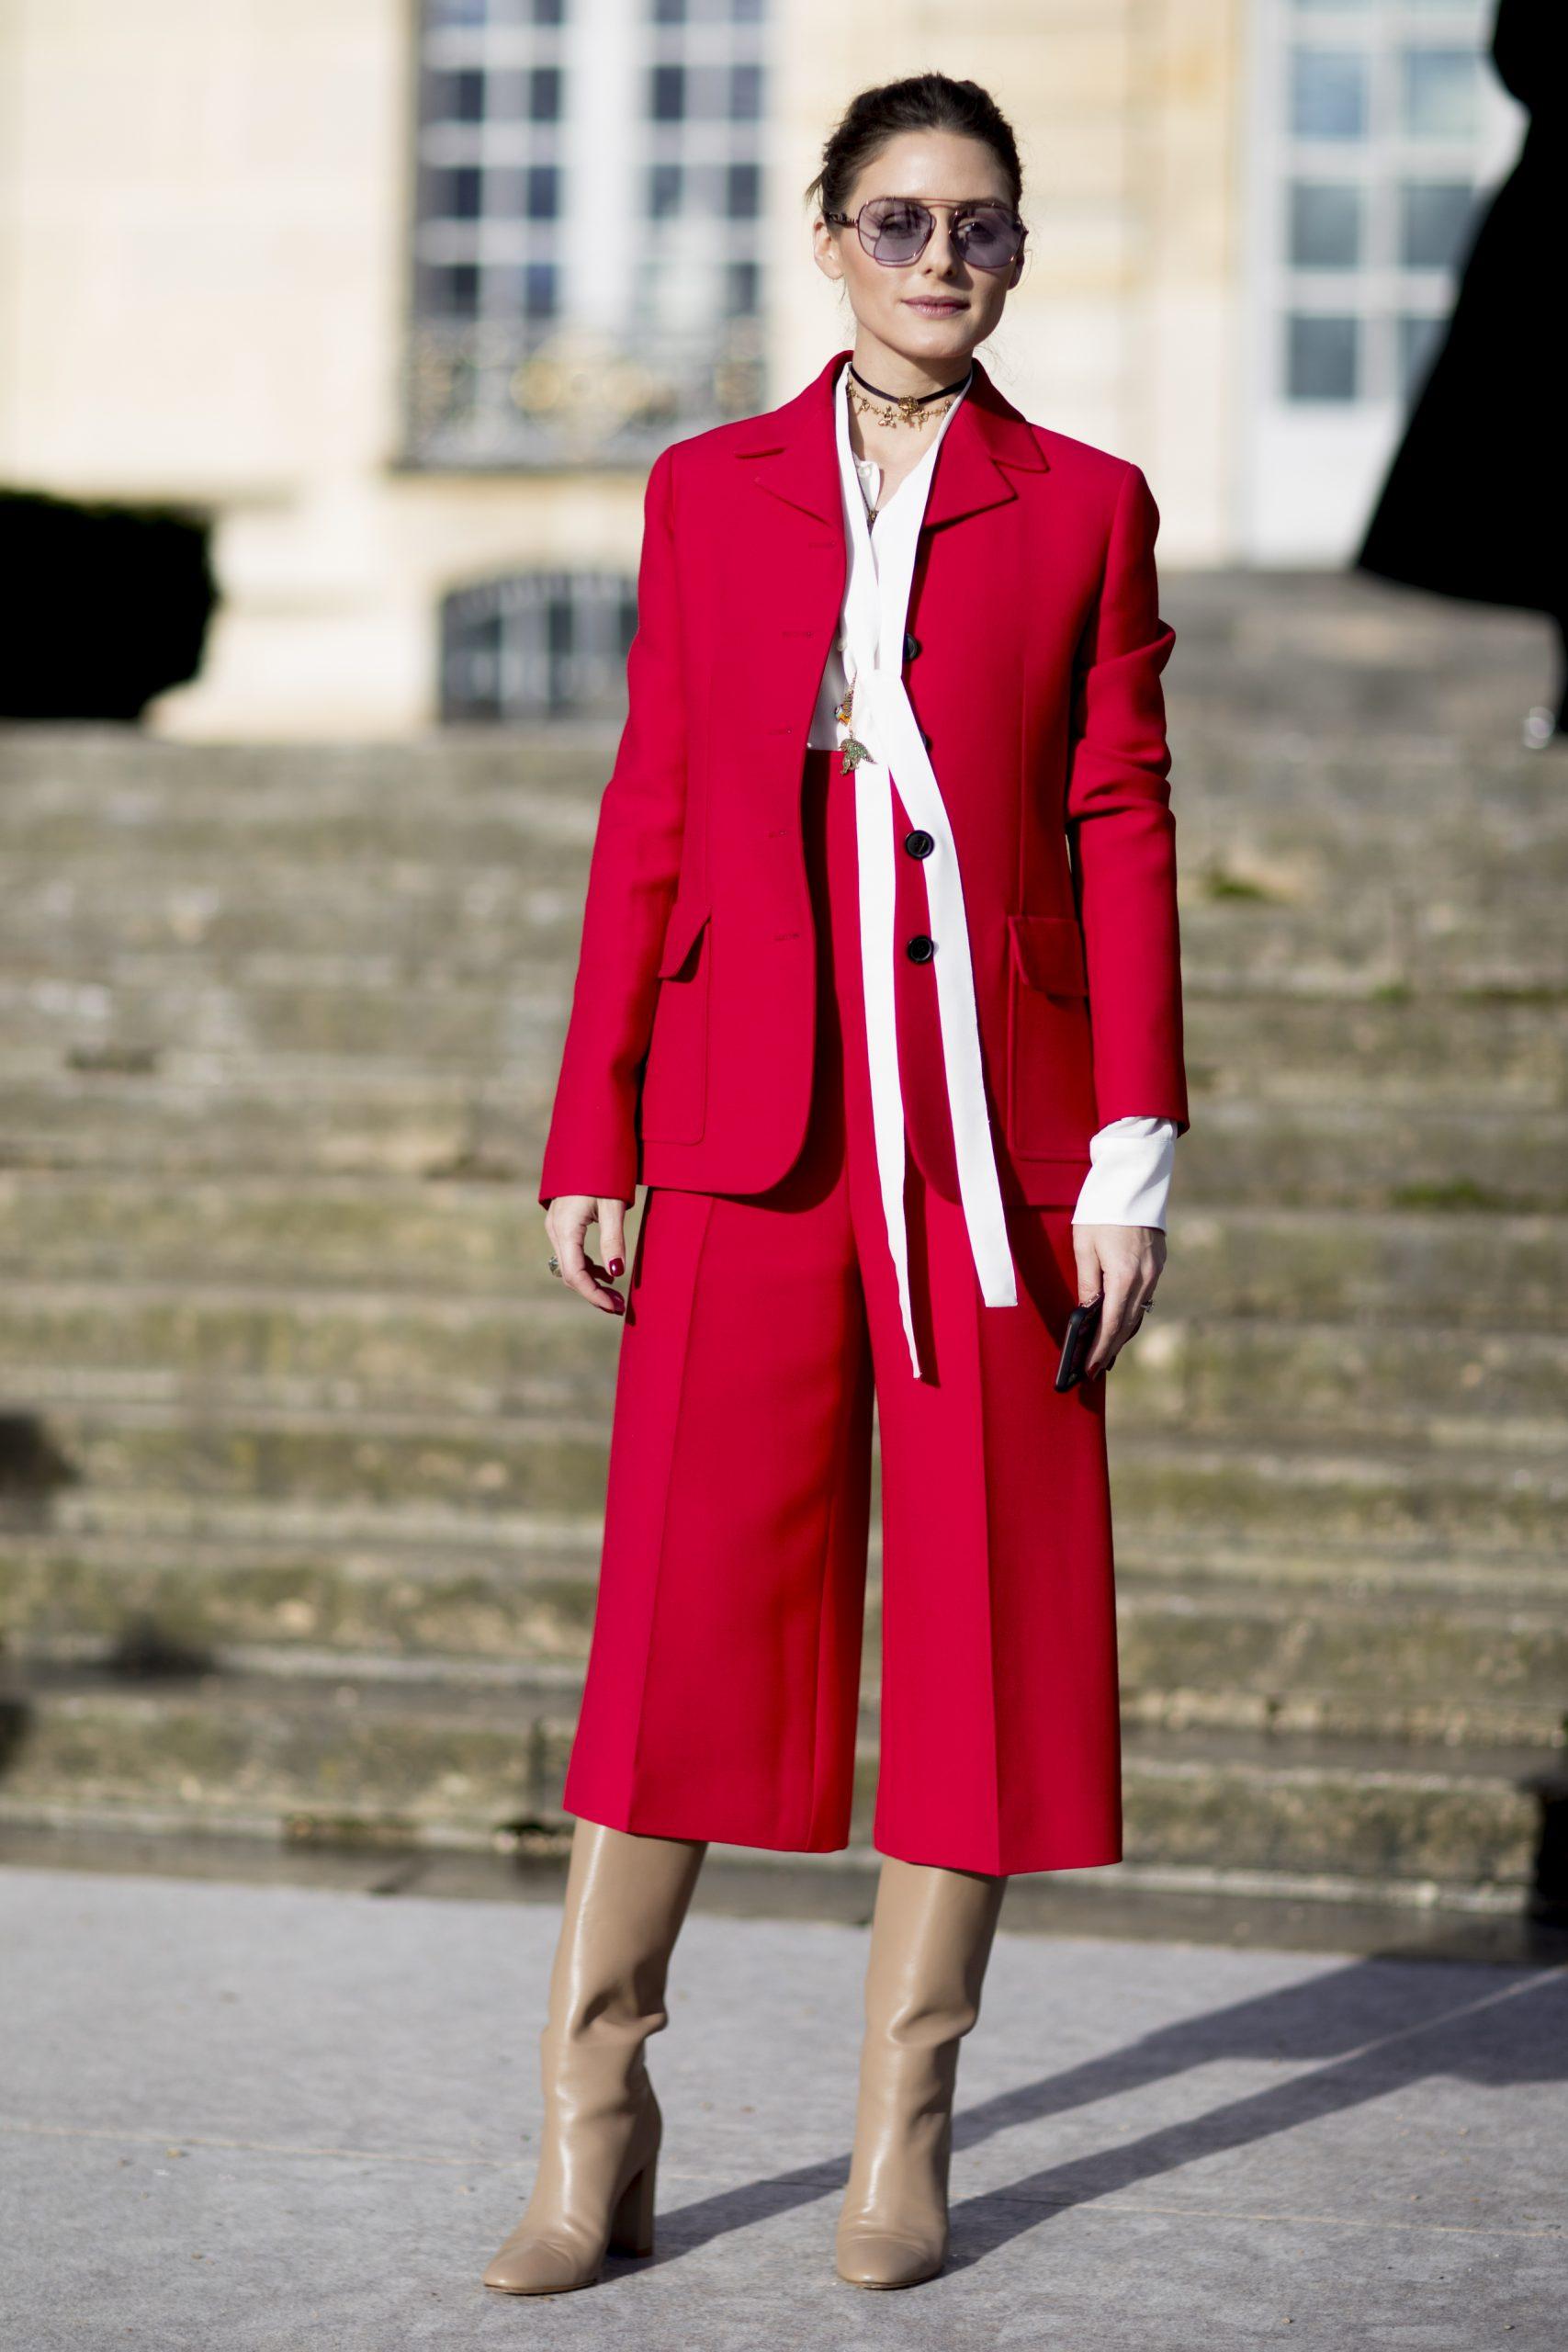 Olivia Palermo con traje rojo.